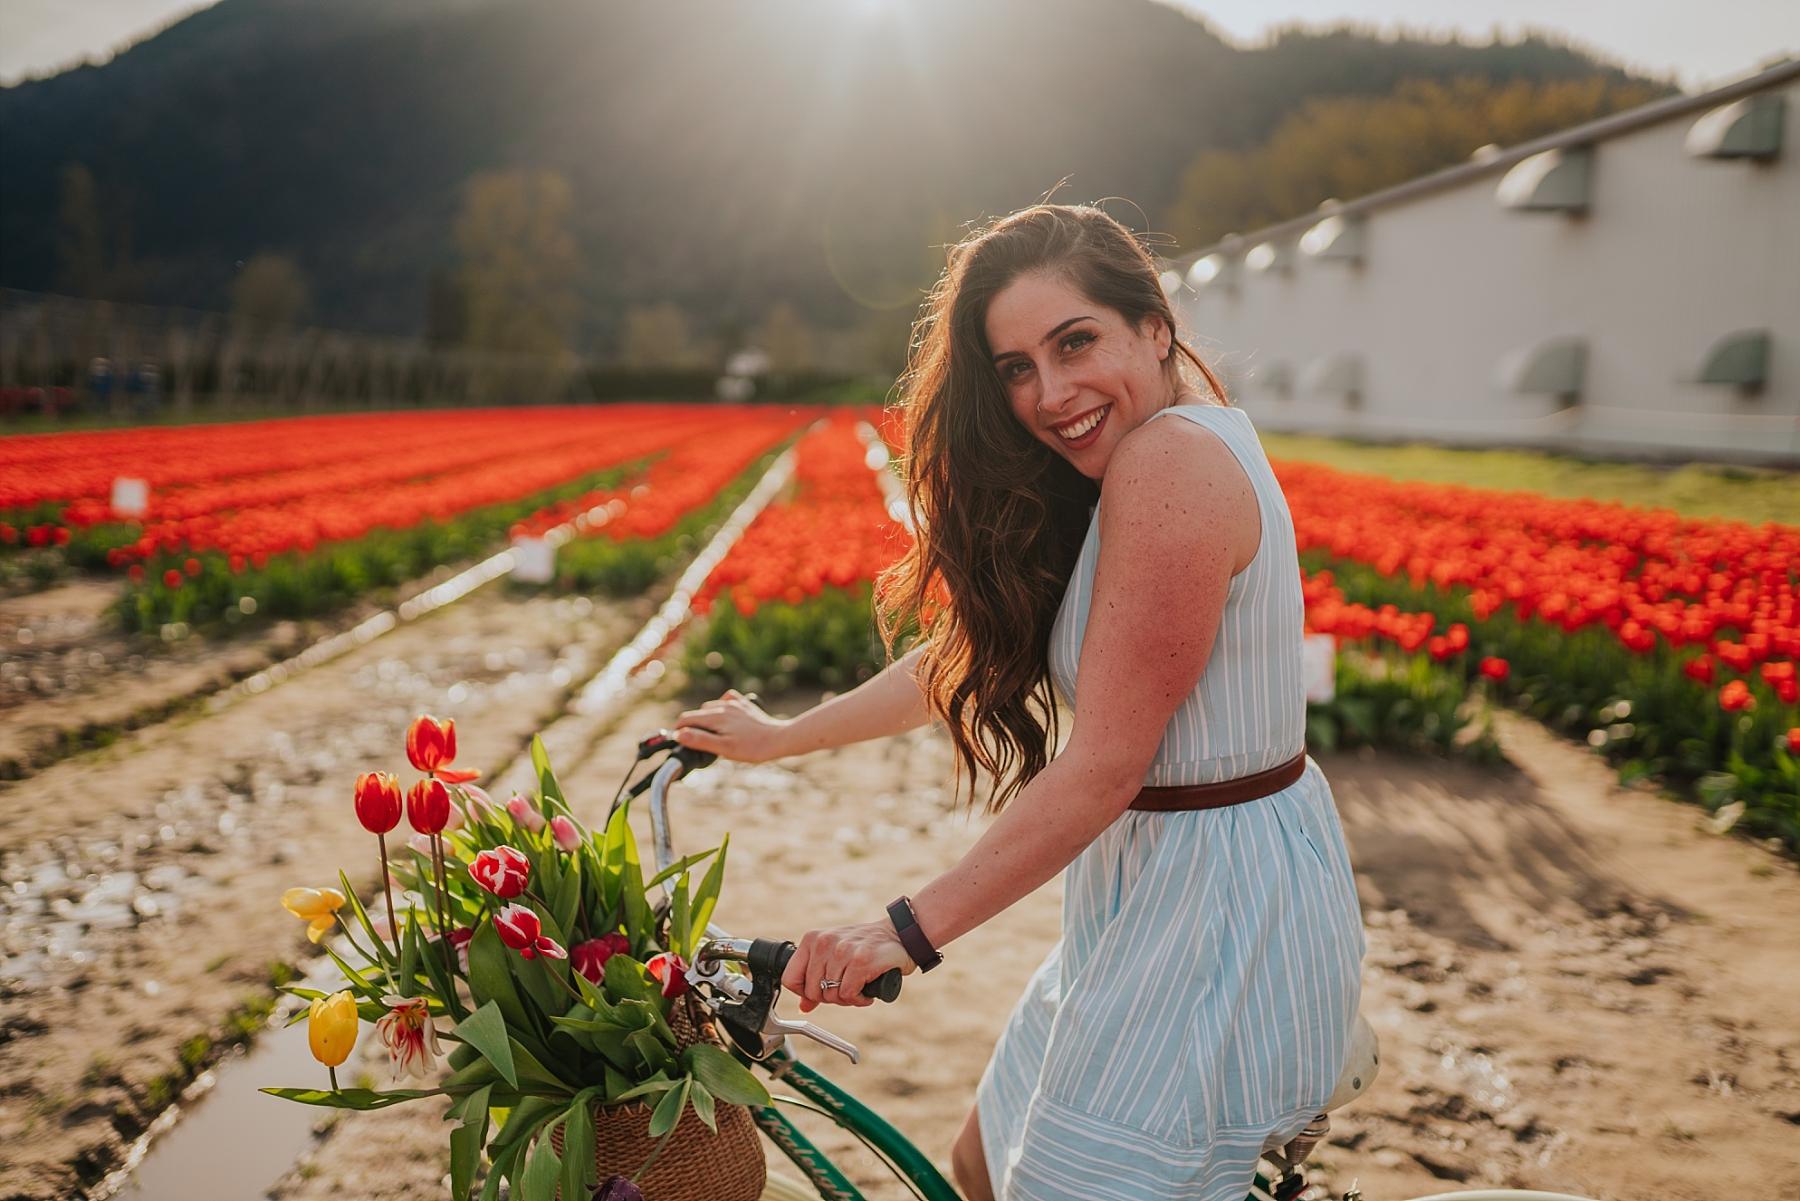 chilliwack tulip festival 2019